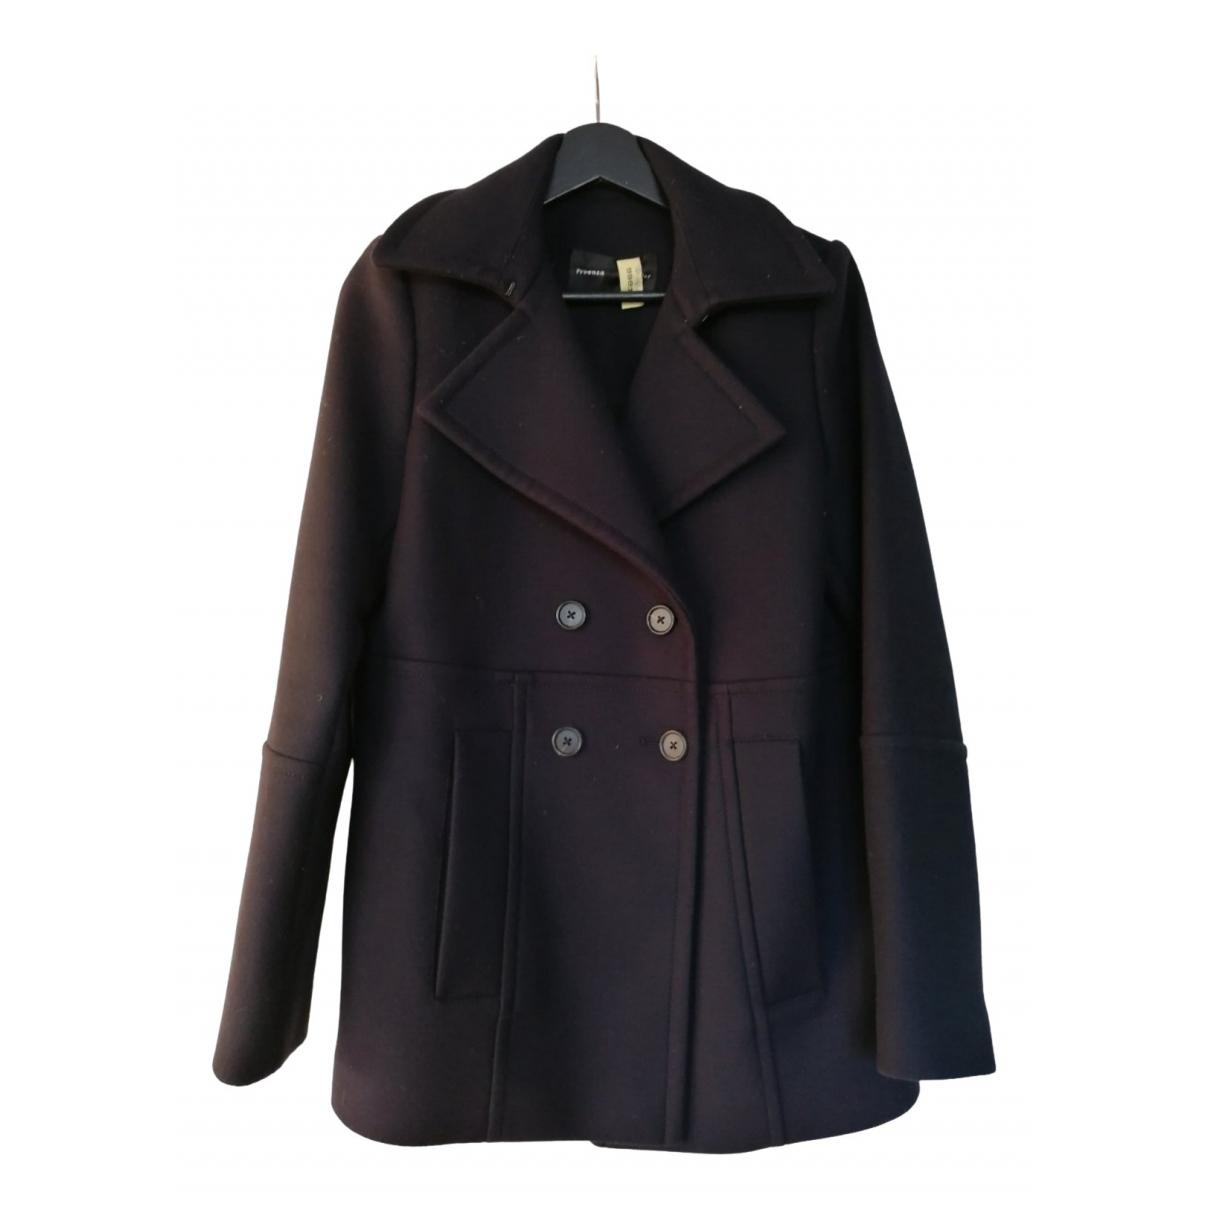 Proenza Schouler \N Blue Wool coat for Women 4 0-5